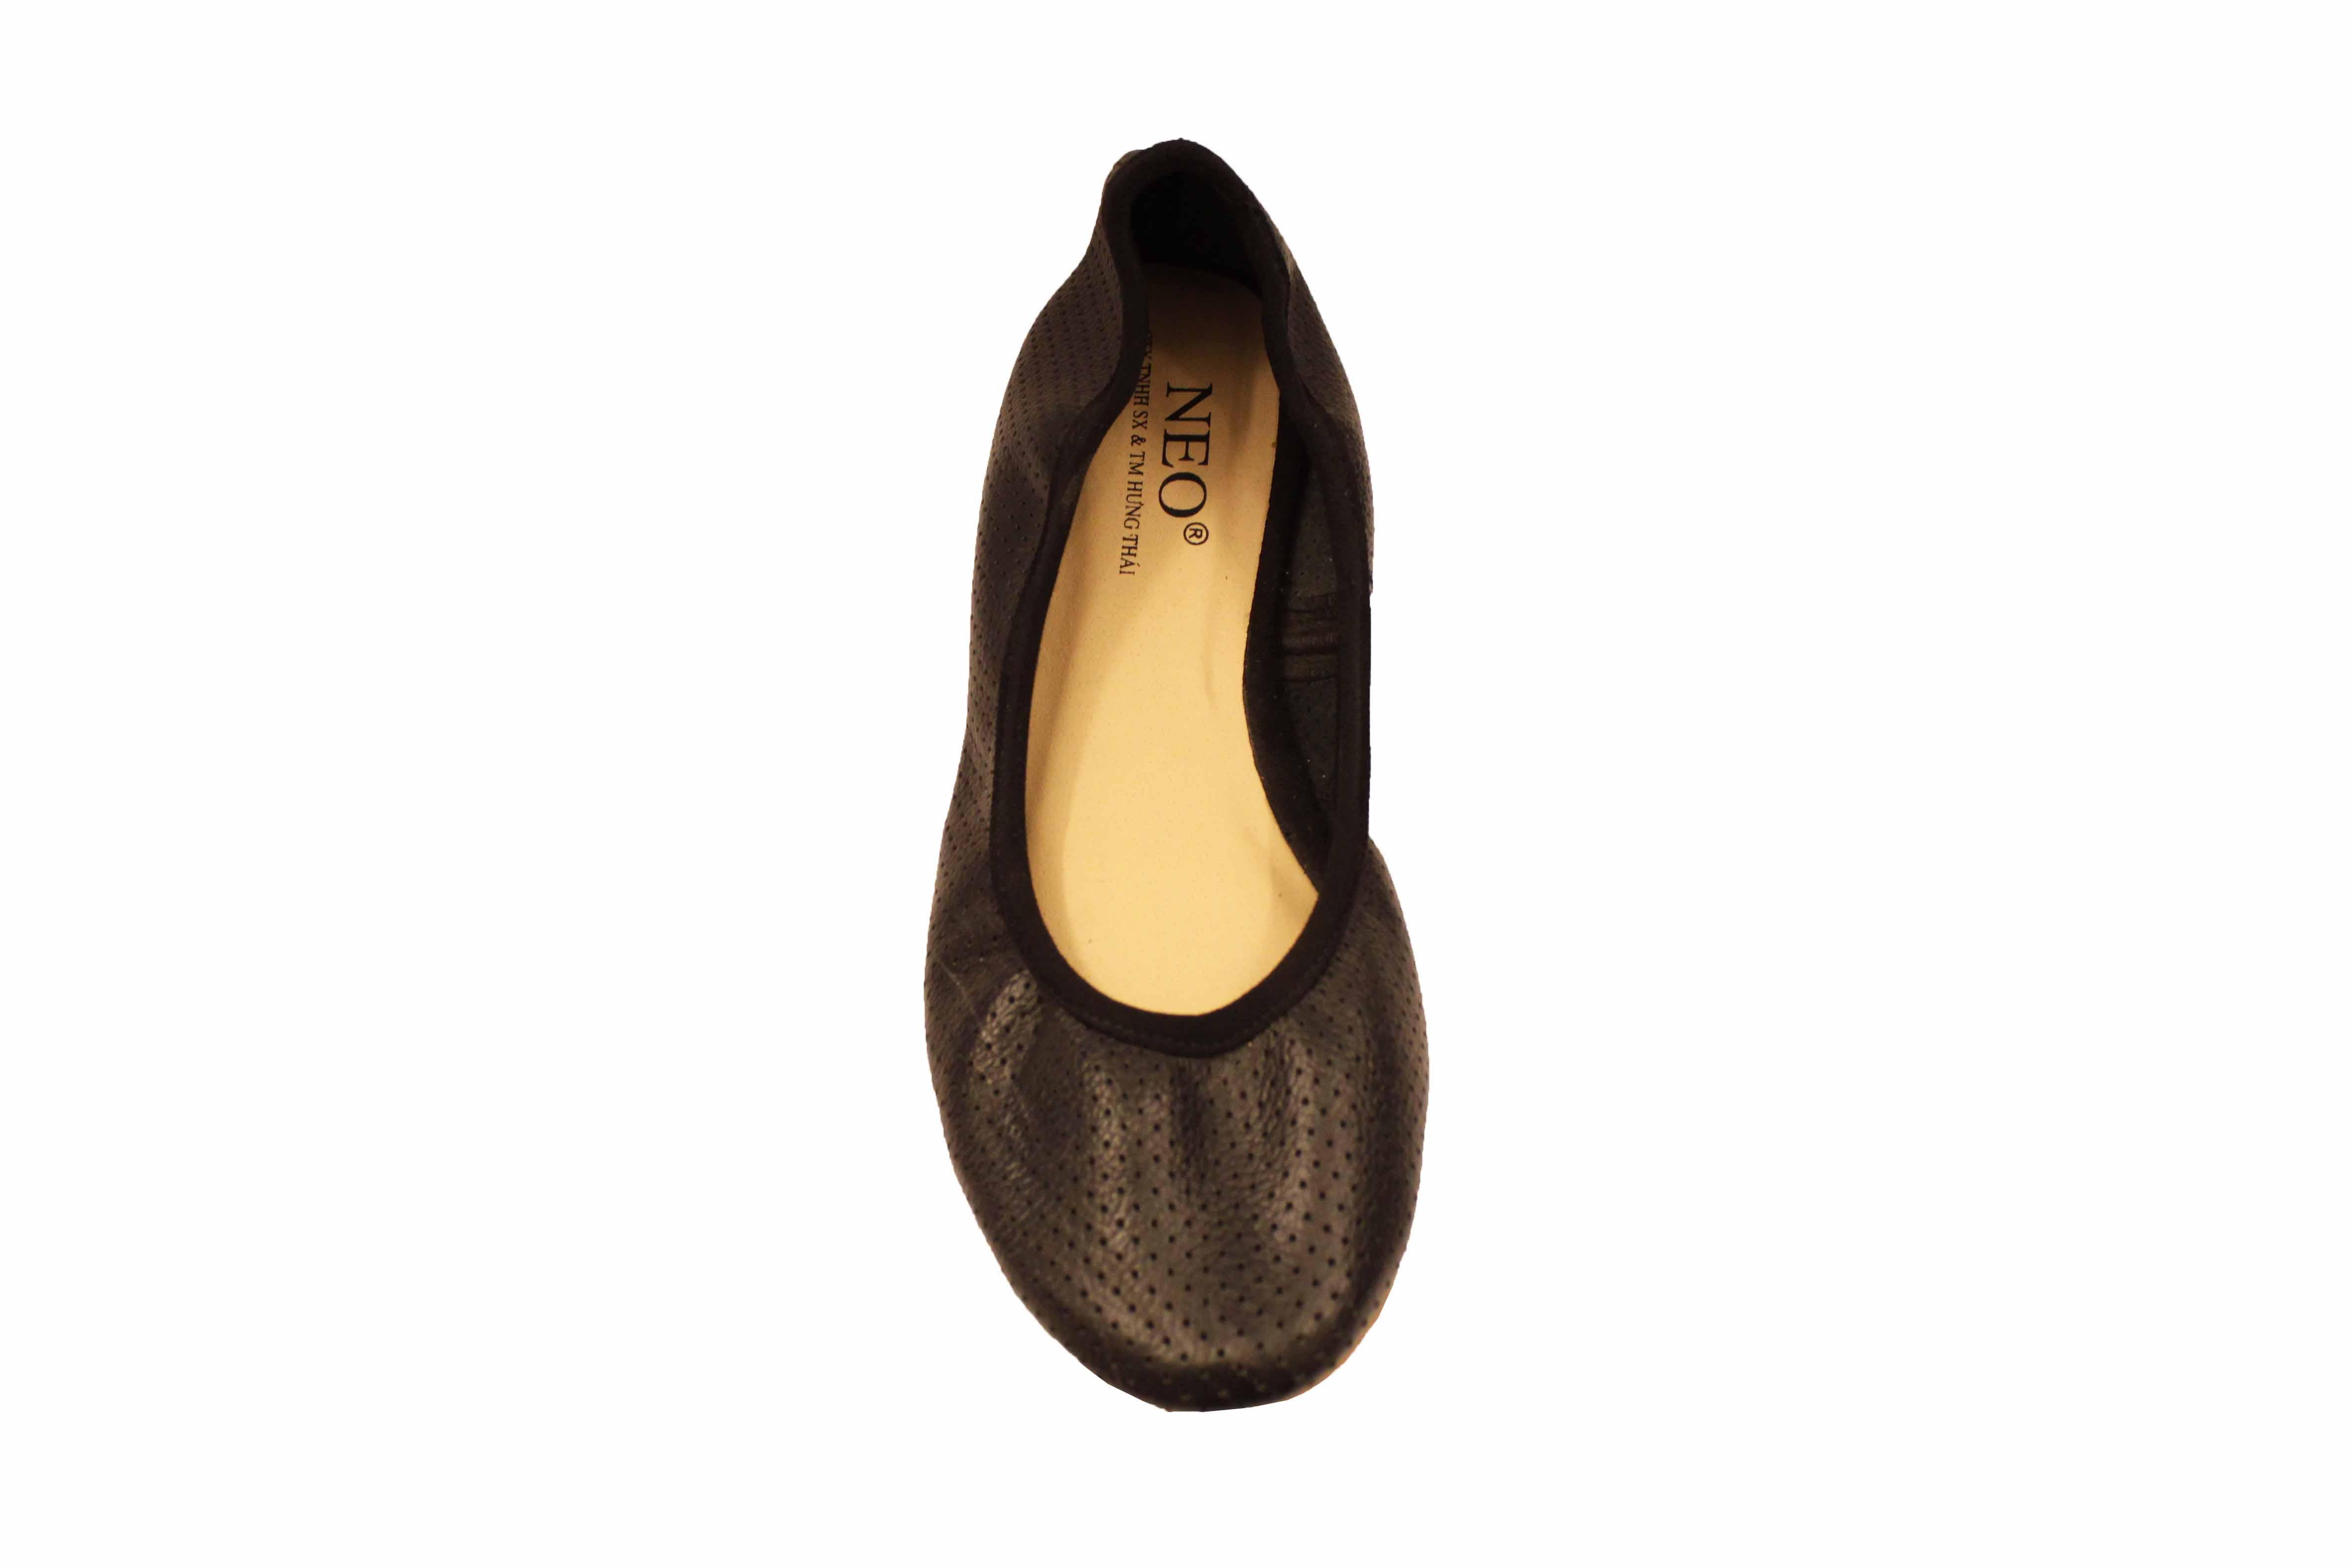 giày da mềm đục lỗ